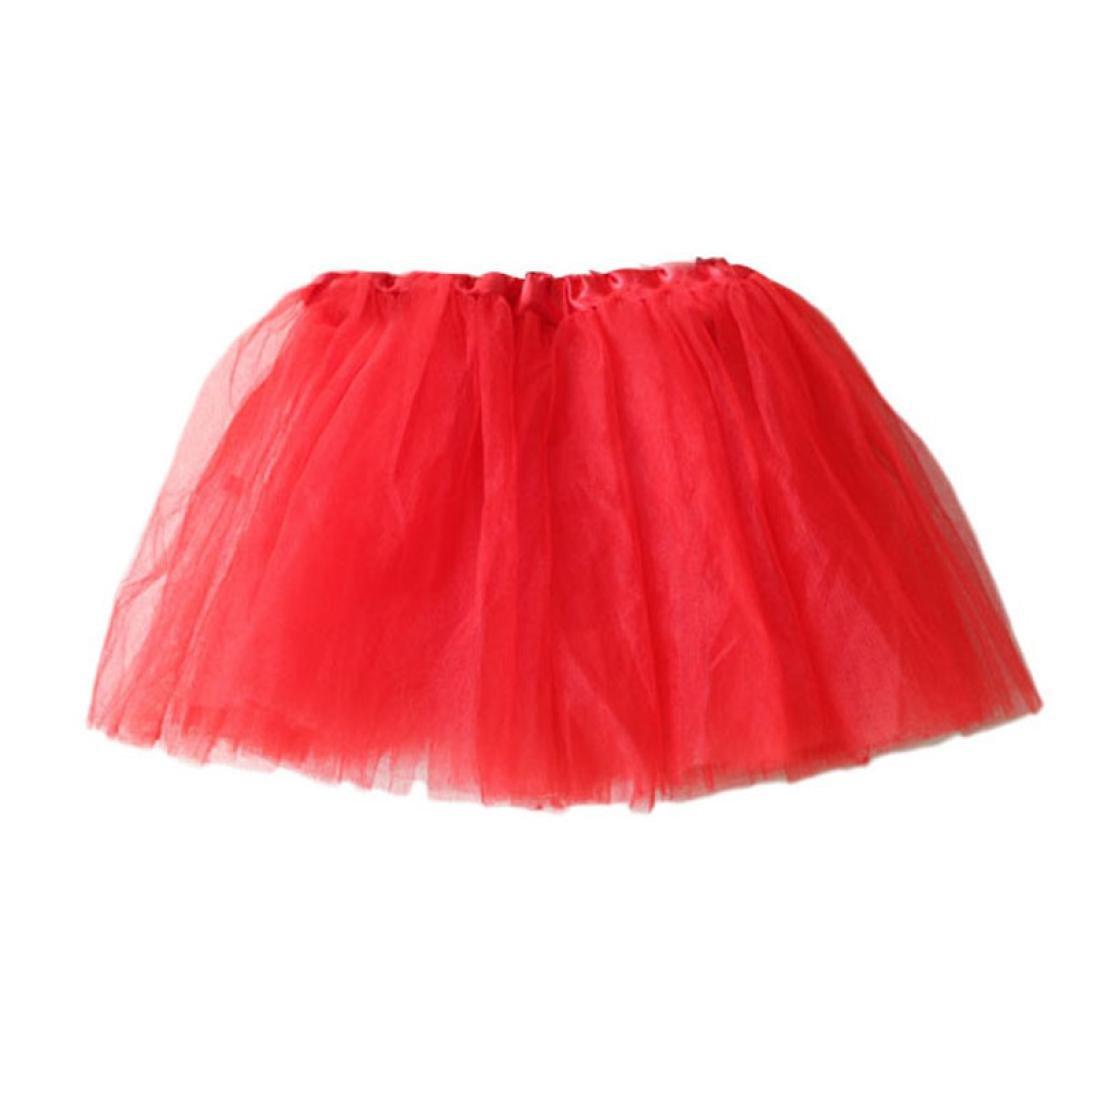 Koly Girls Princess Pettiskirt Party Ballet Tutu Baby Skirt Mini Dress Koly-DVC0